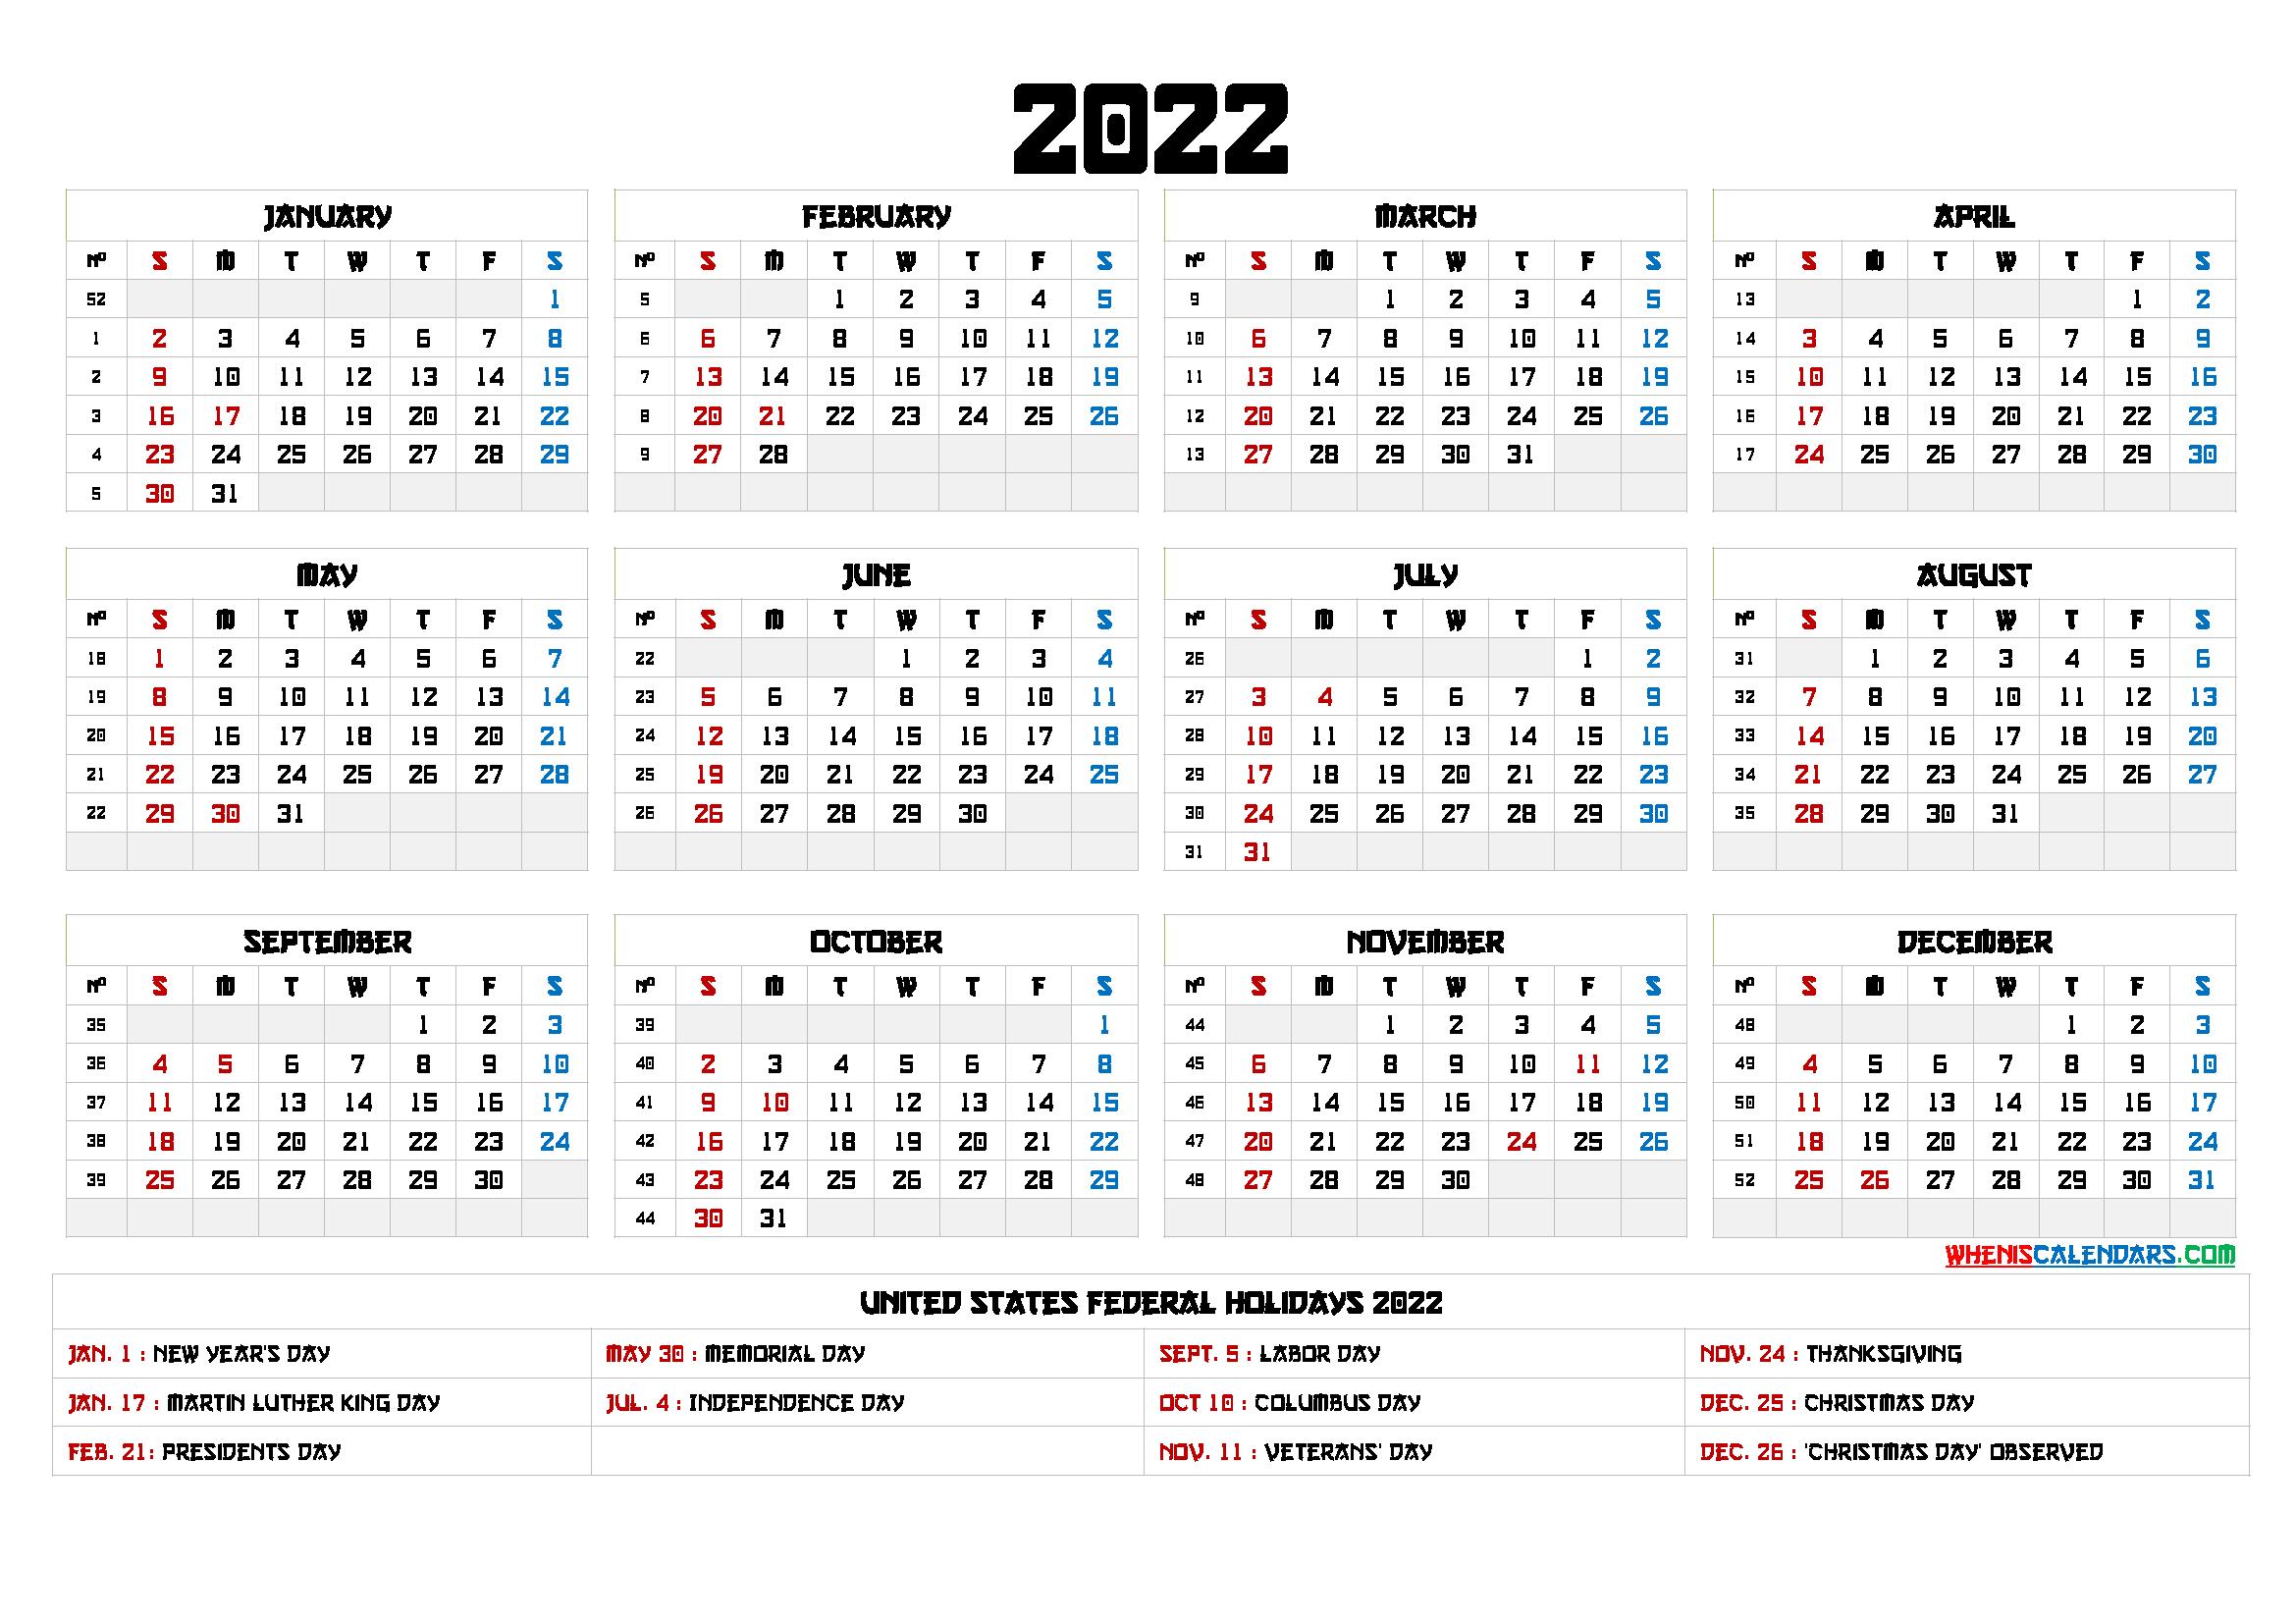 Free Printable Calendar 2022 With Holidays - 9 Templates